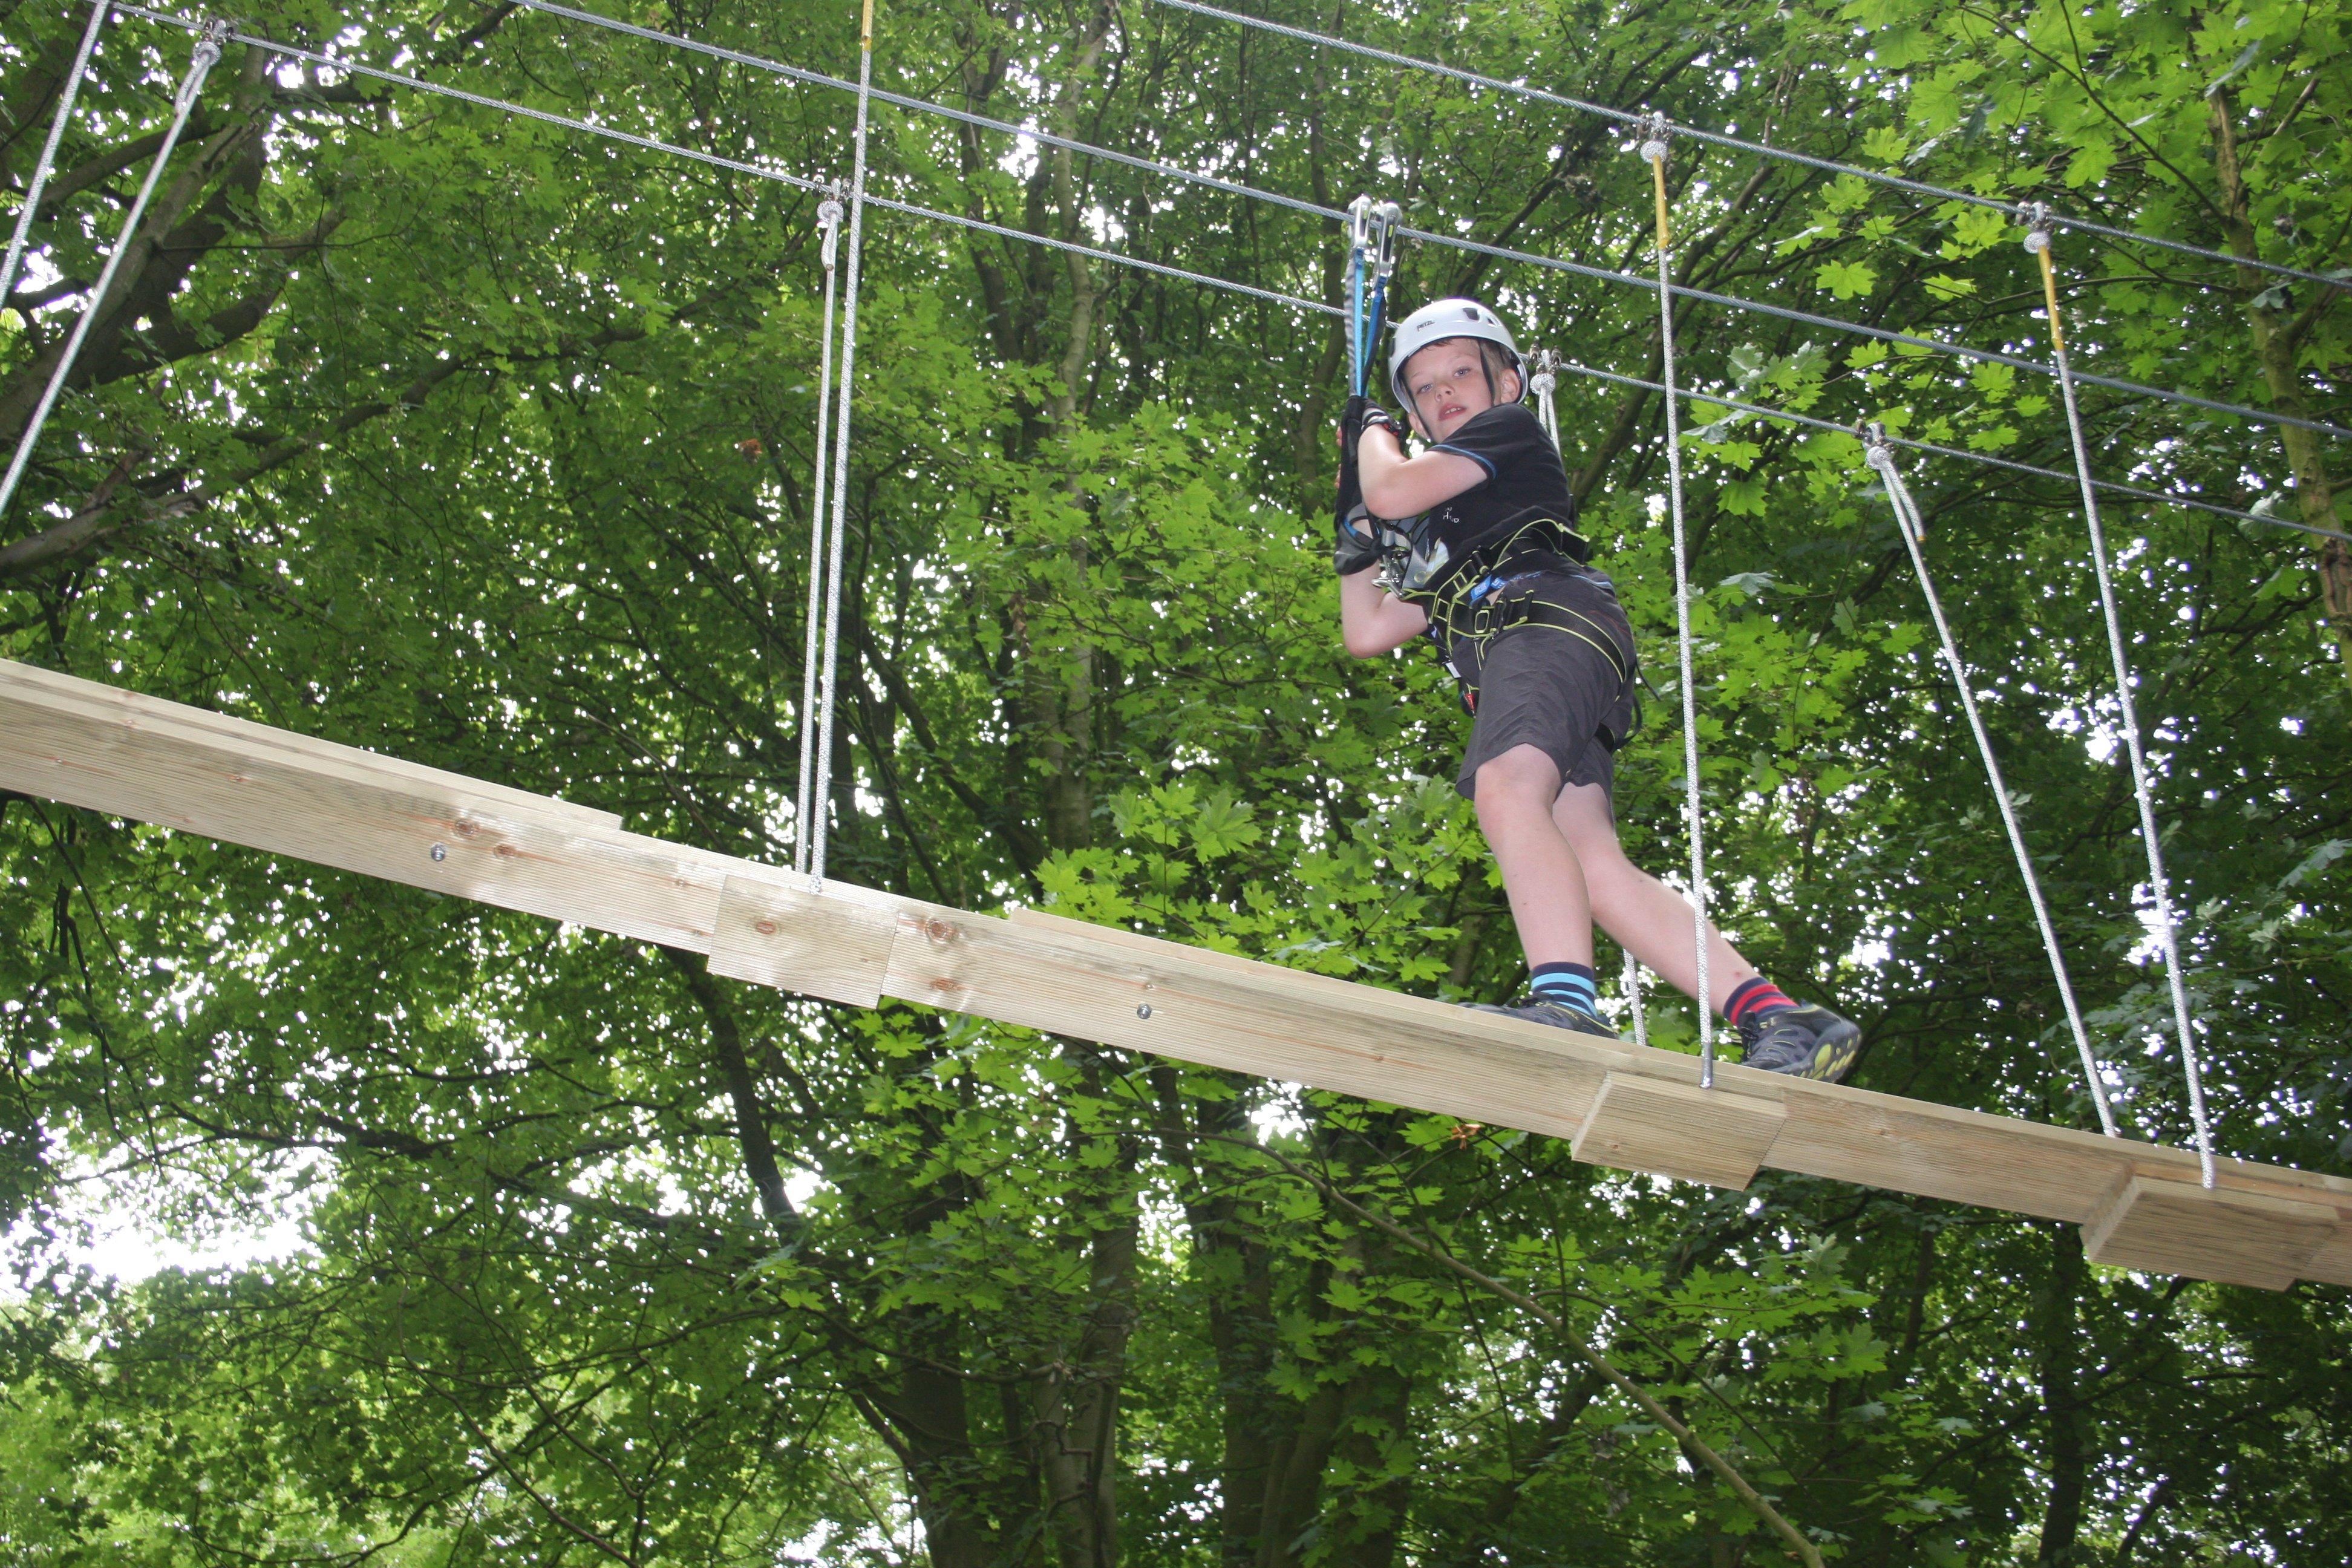 Raven Tree Top Adventure plank bridge